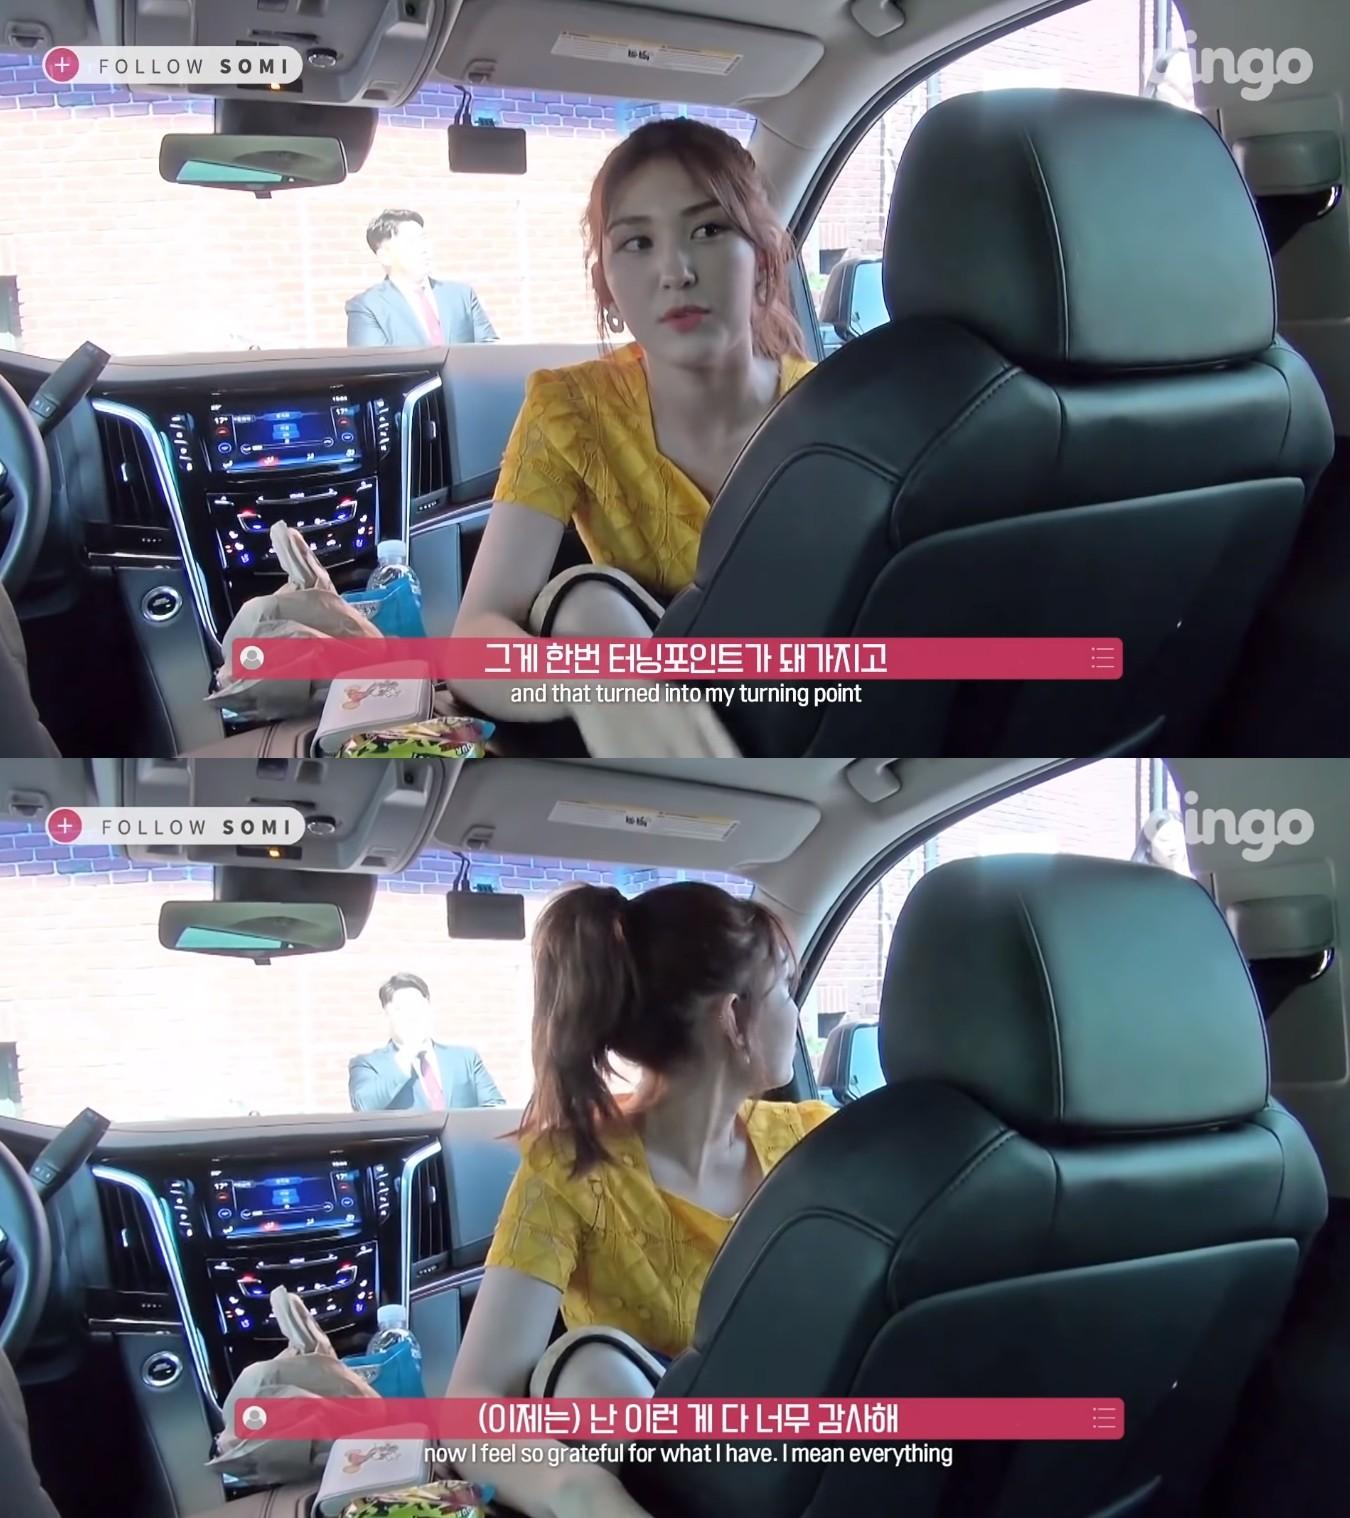 ▲SOMI看見《BIRTHDAY》MV哭了。(圖/翻攝自딩고 뮤직 / dingo music YouTube)